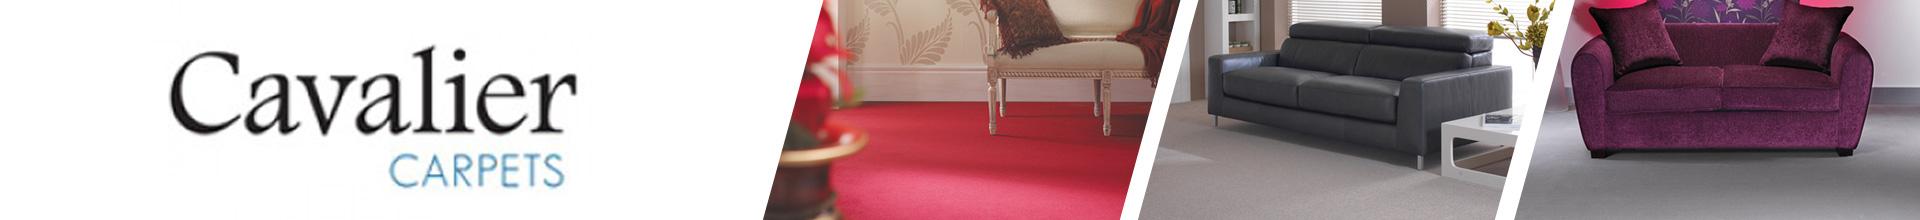 John Lynch Carpets - Cavalier Carpets